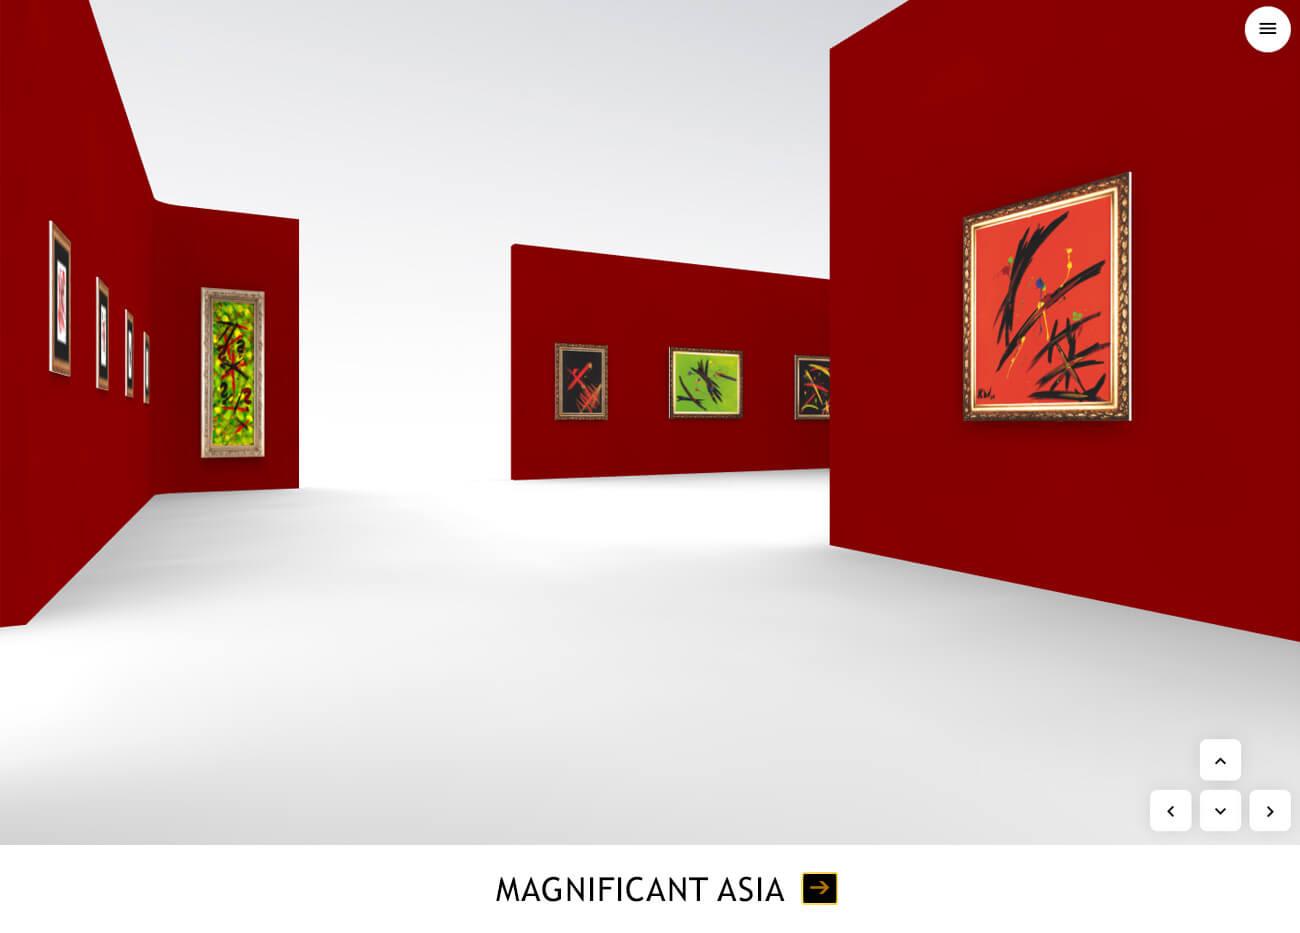 Magnificant Asia